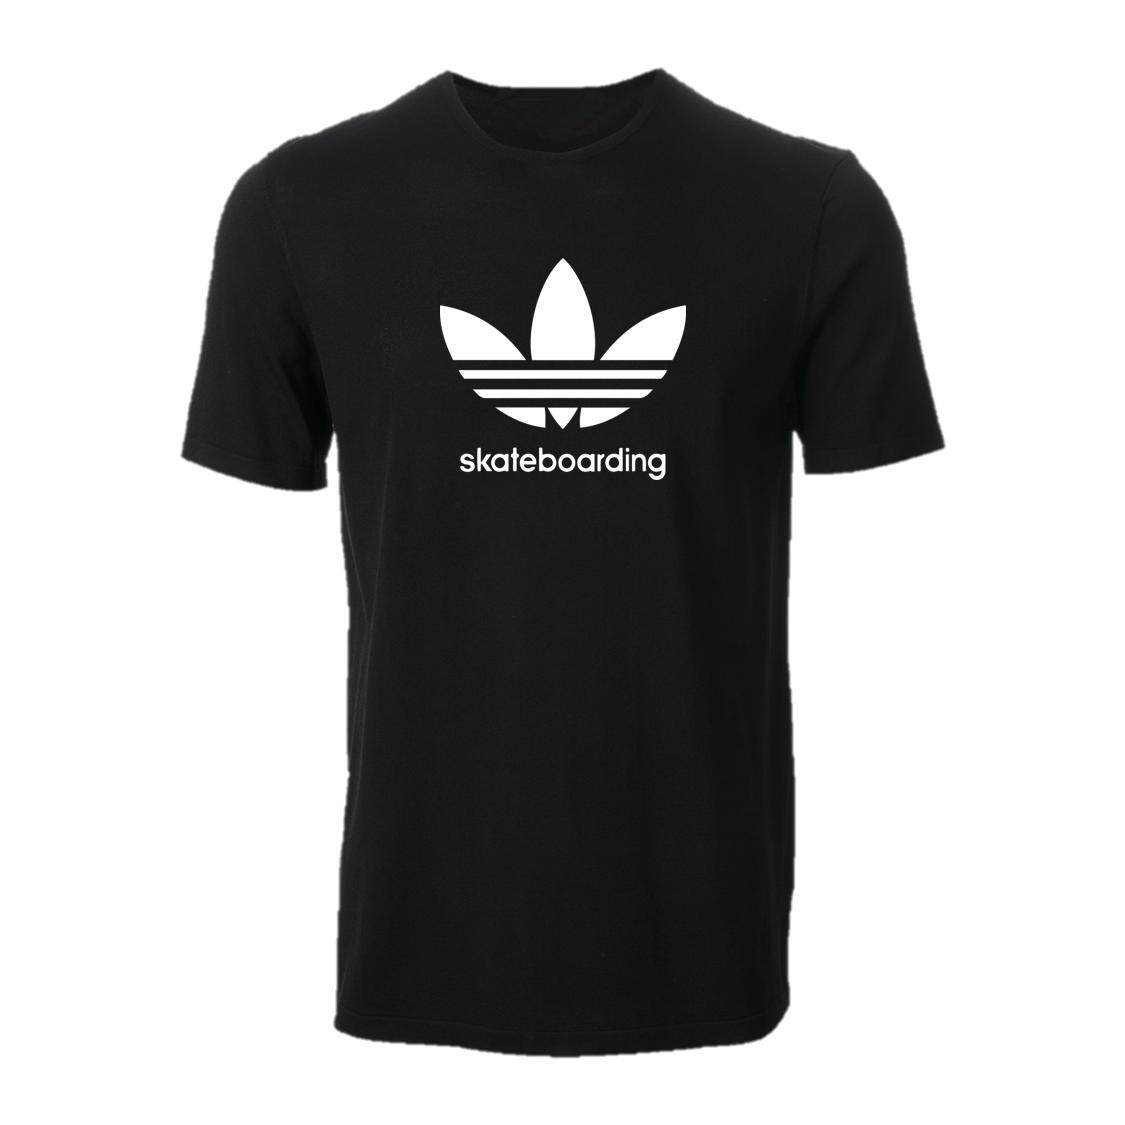 Fitur Adidas Tas Ransel Trefoil Backpack Bk6718 Dan Harga Terbaru Skateboarding Streetwear Tshirt Ready Stock